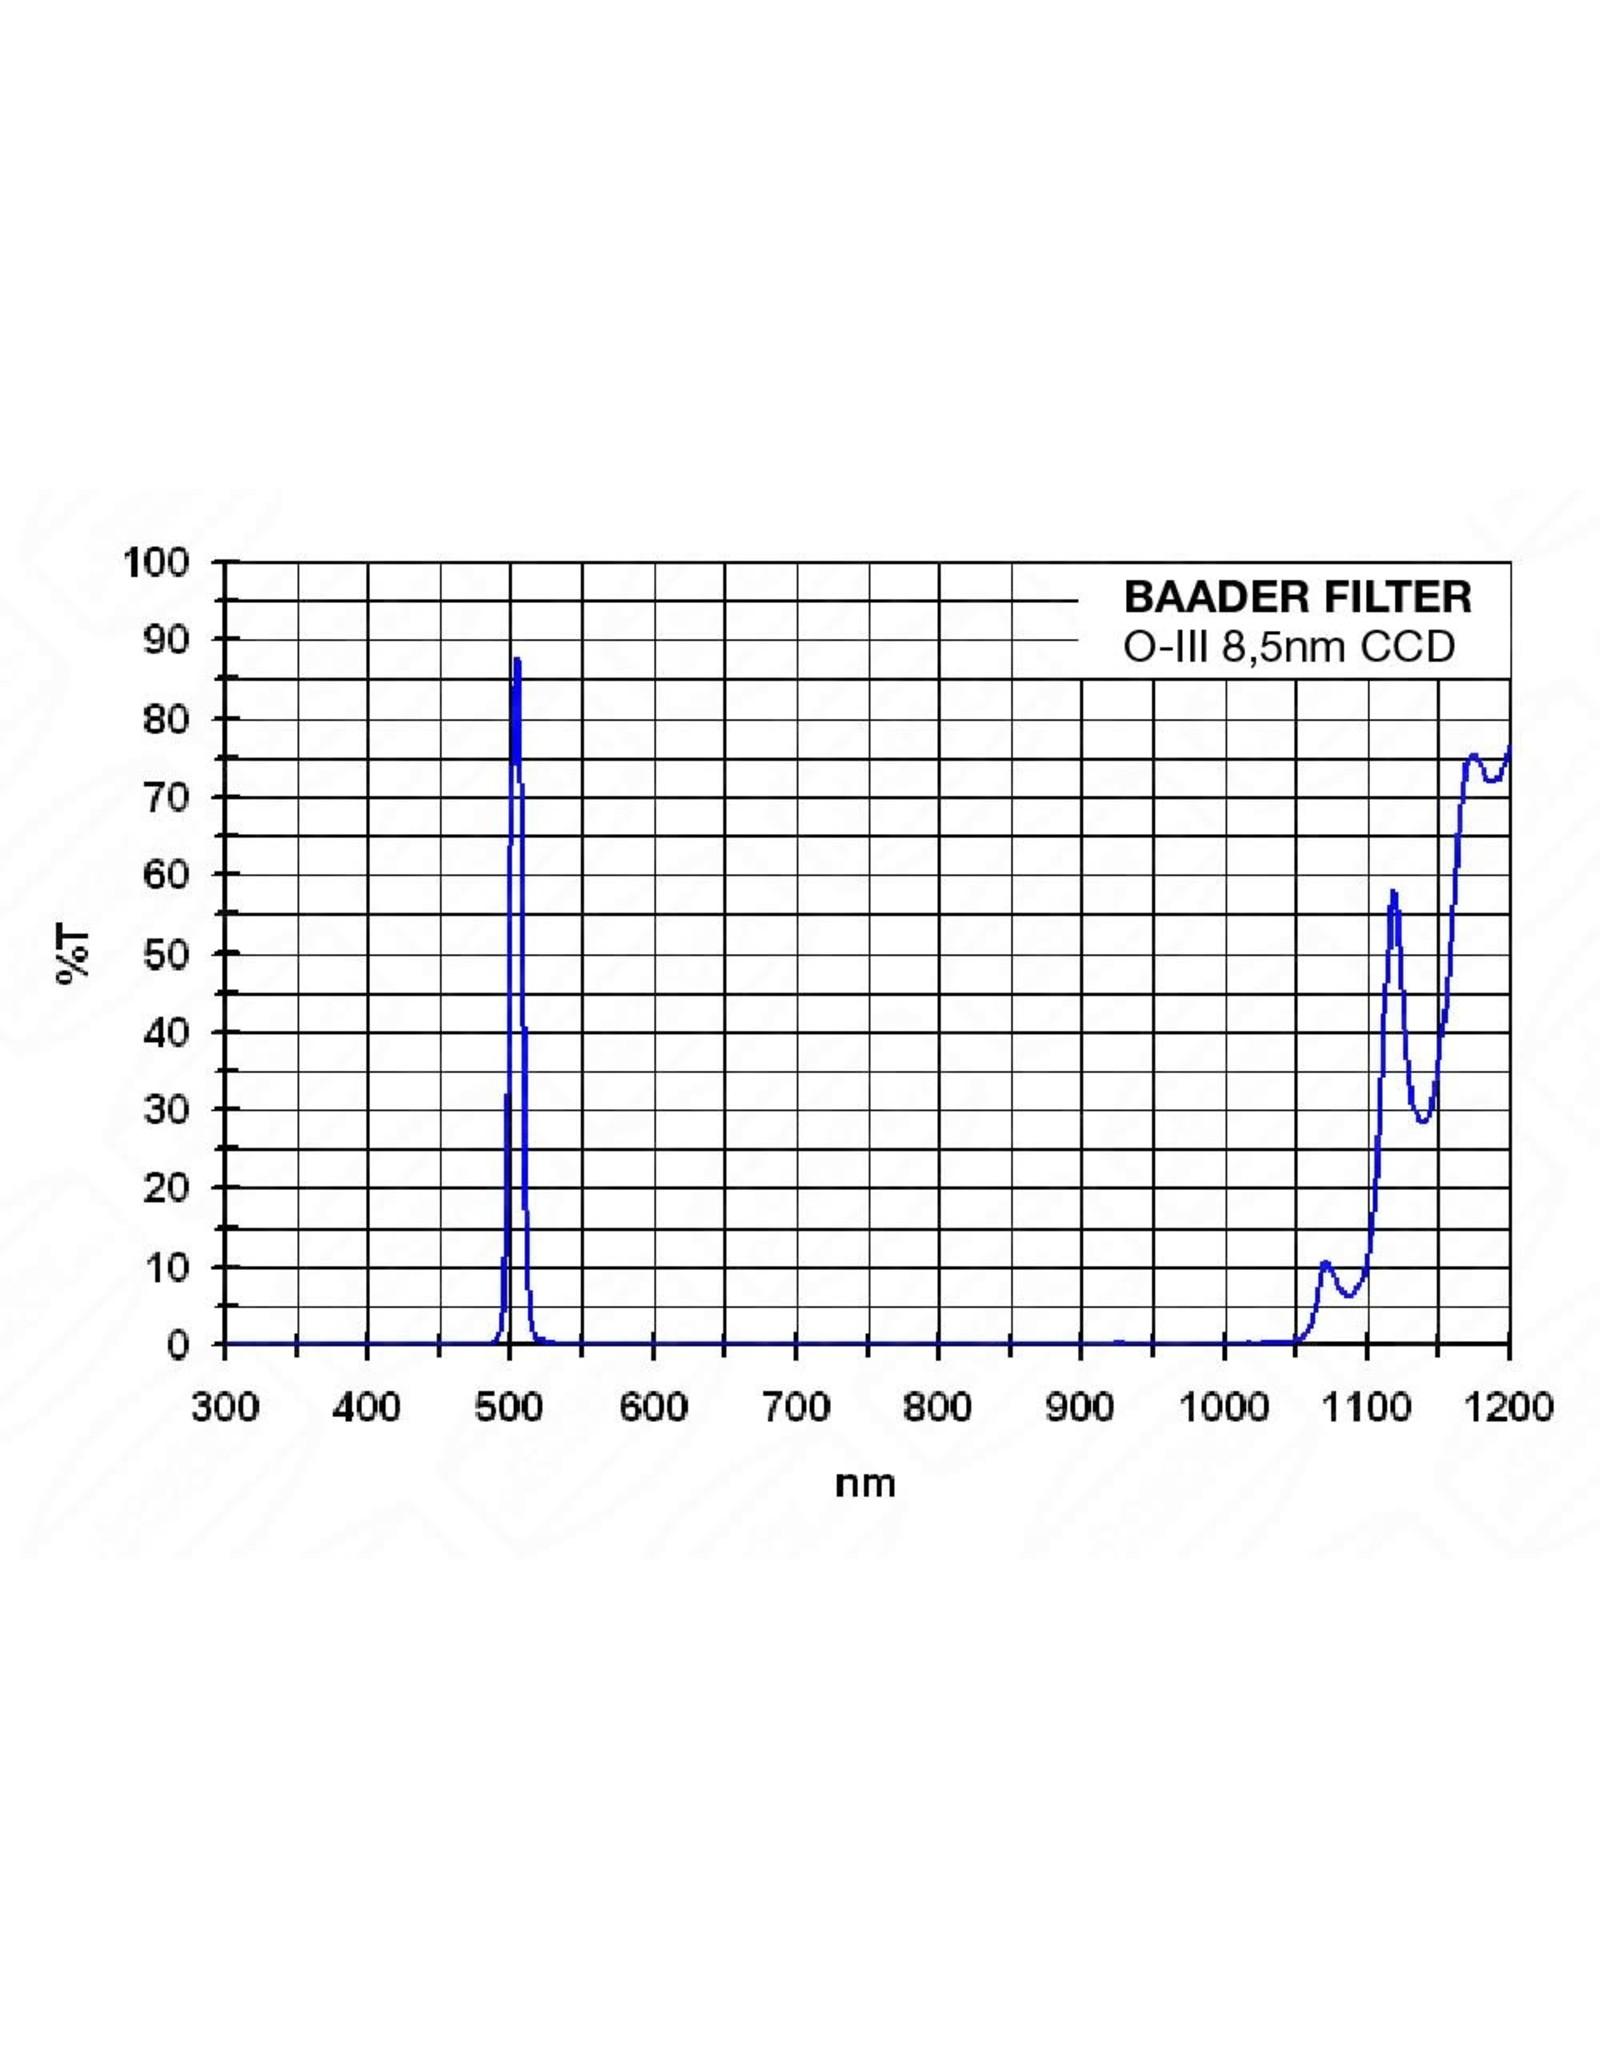 Baader Planetarium Baader O-III 8.5nm CCD Narrowband Filter (Specify Size)